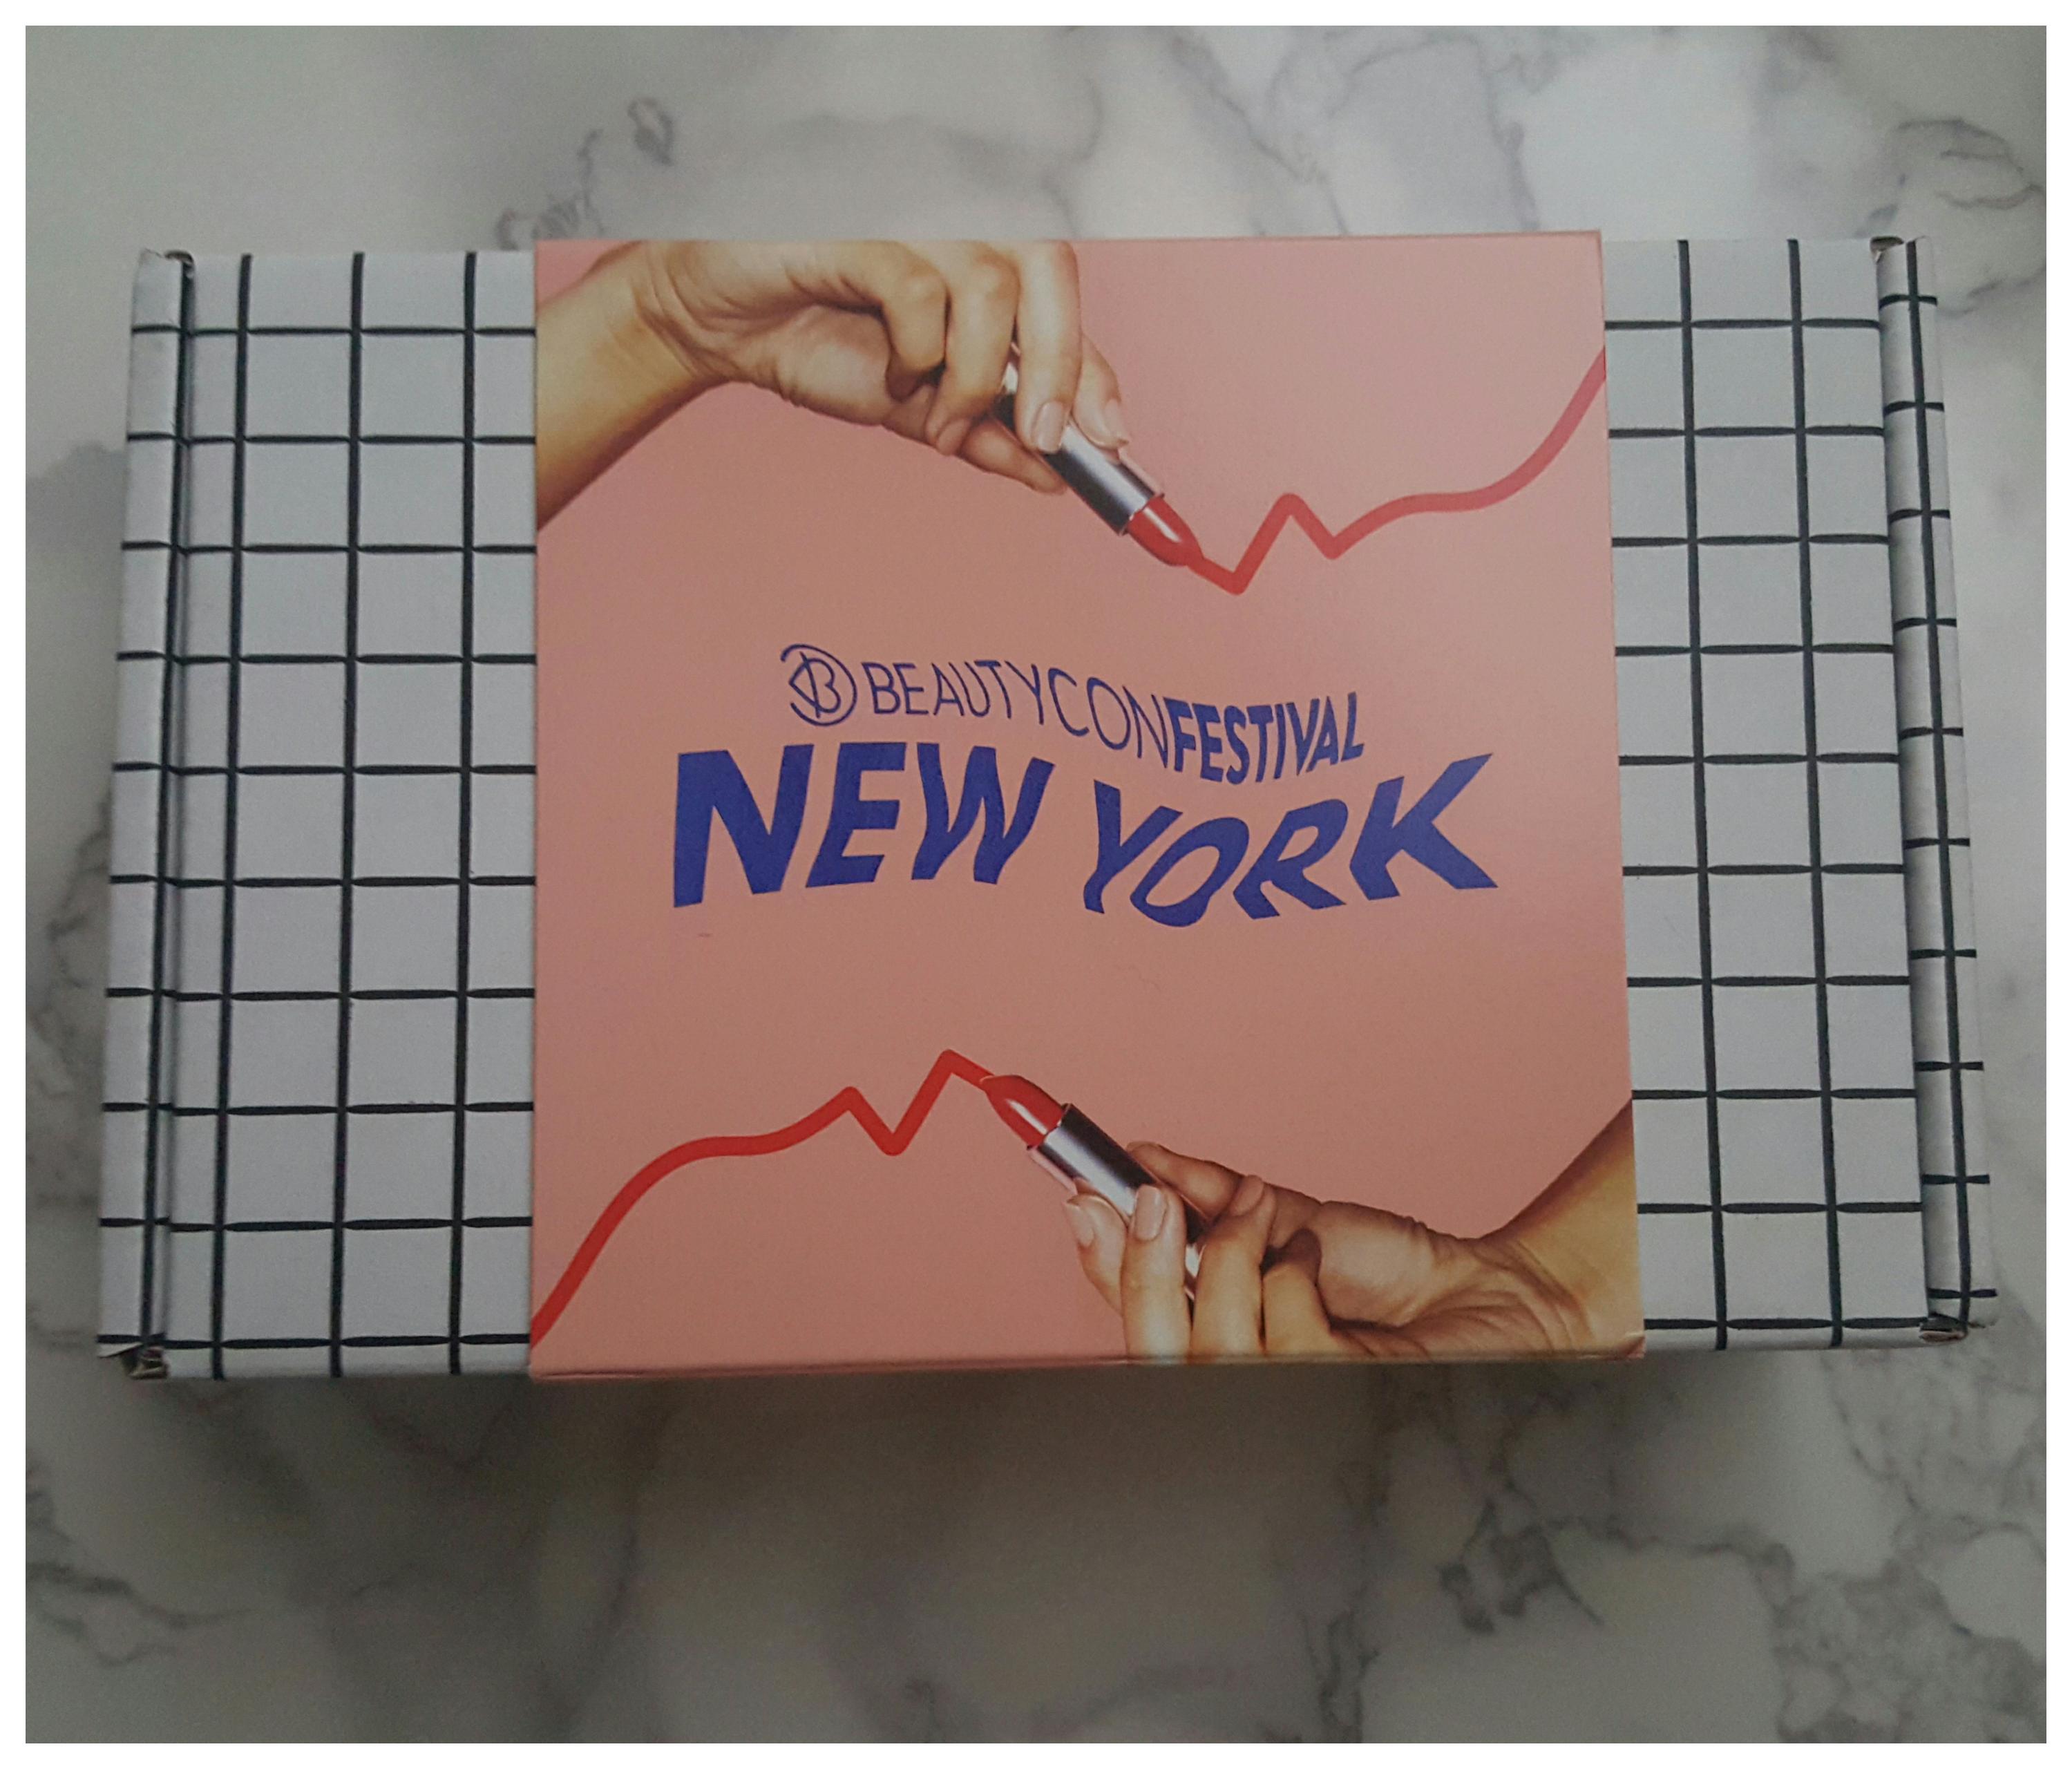 ::REVIEW:: BEAUTYCON NEW YORK BOX!